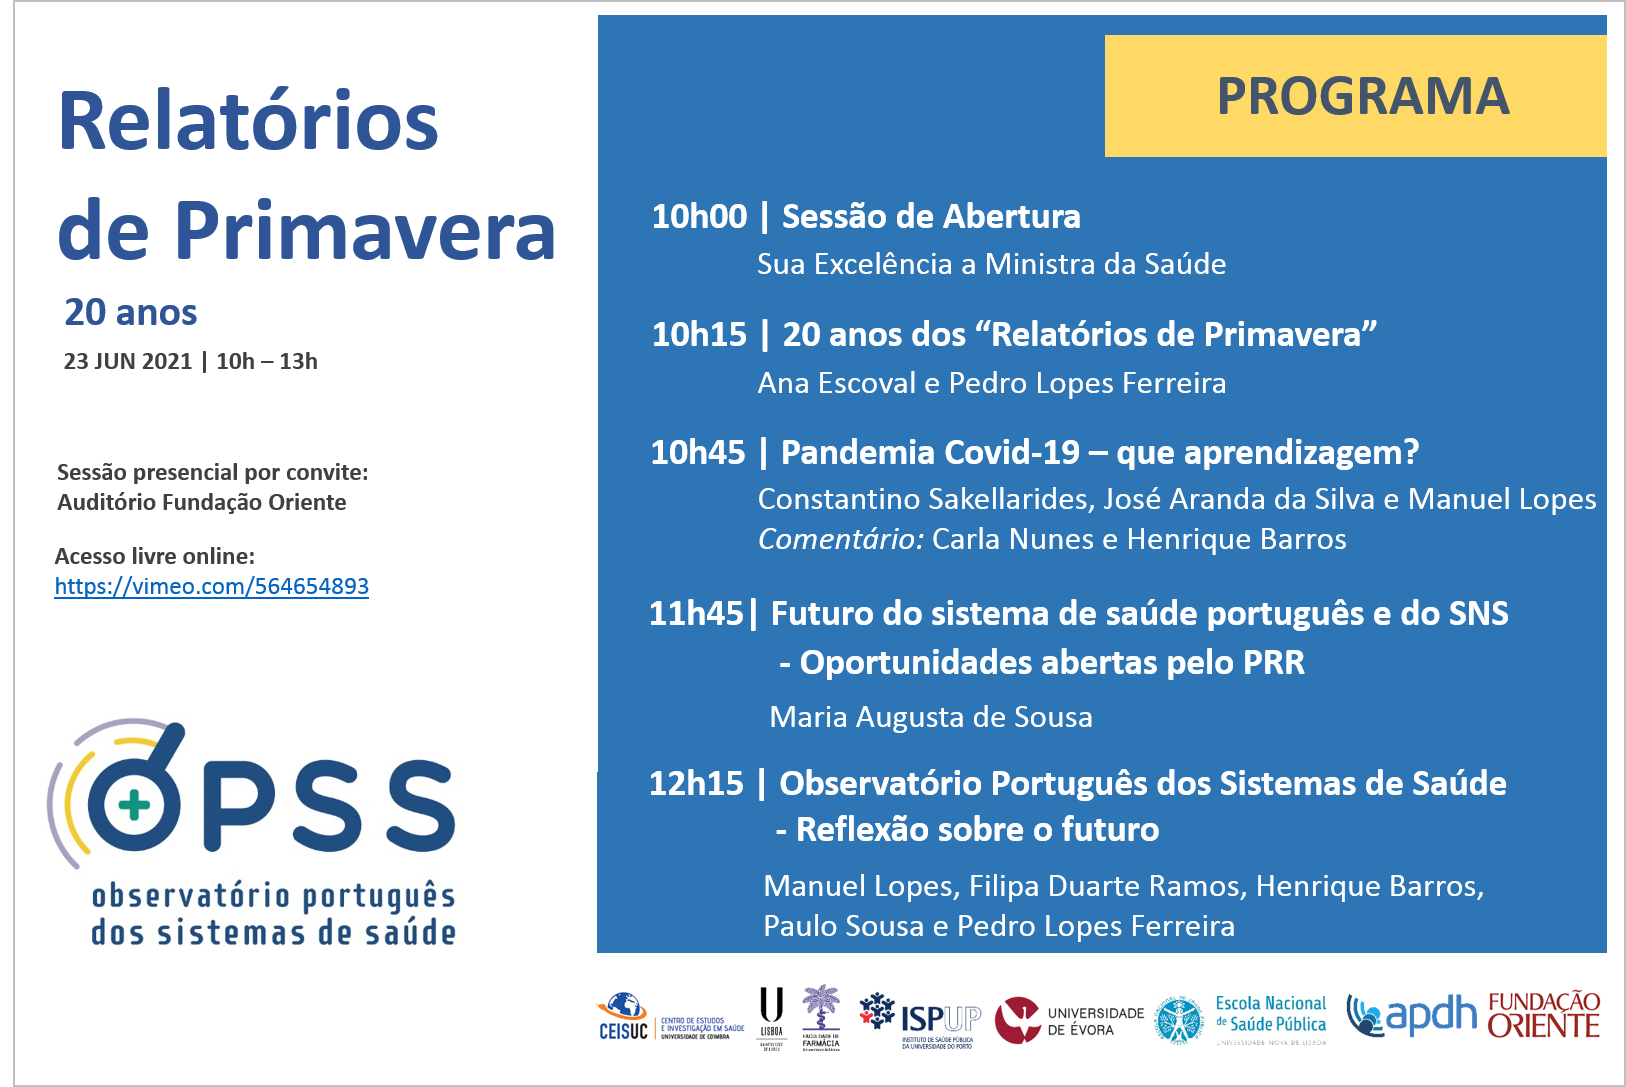 OPSS2021_Programa Finalíssimo.png